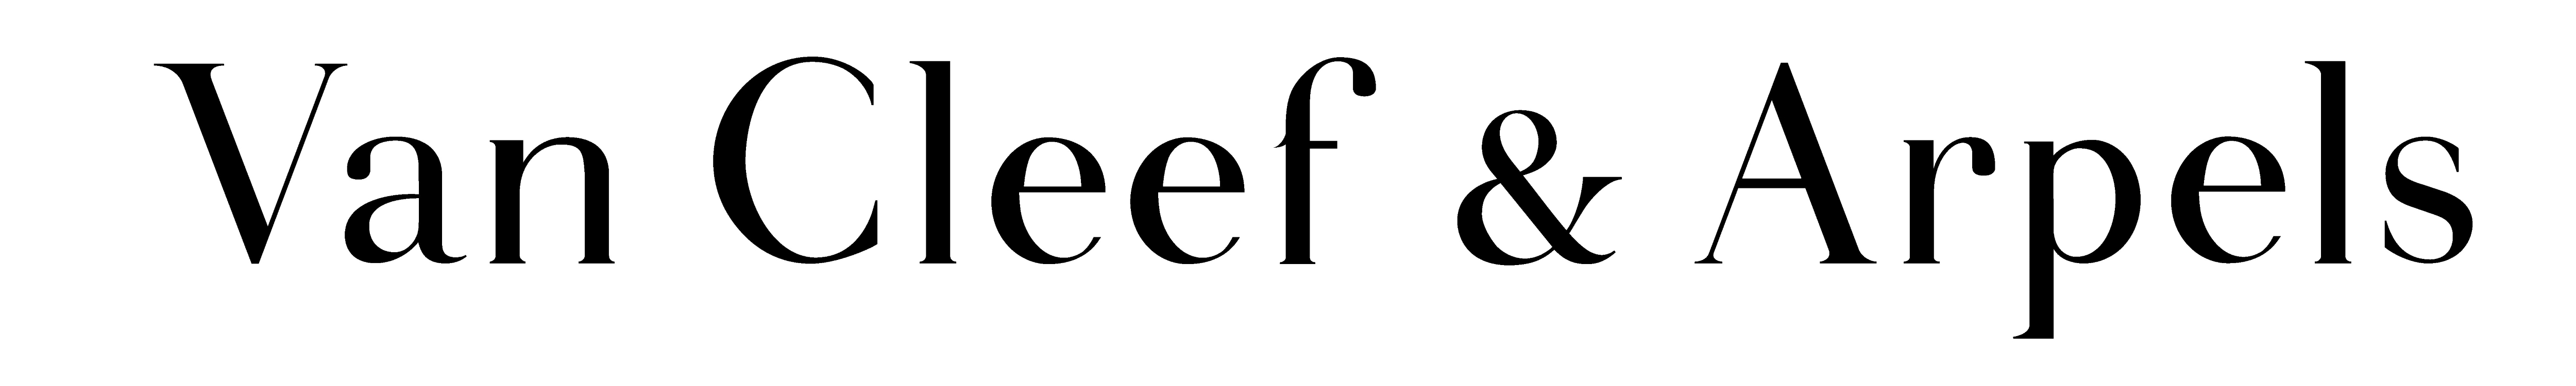 فان كليف اند اربلز Van Cleef Arpels